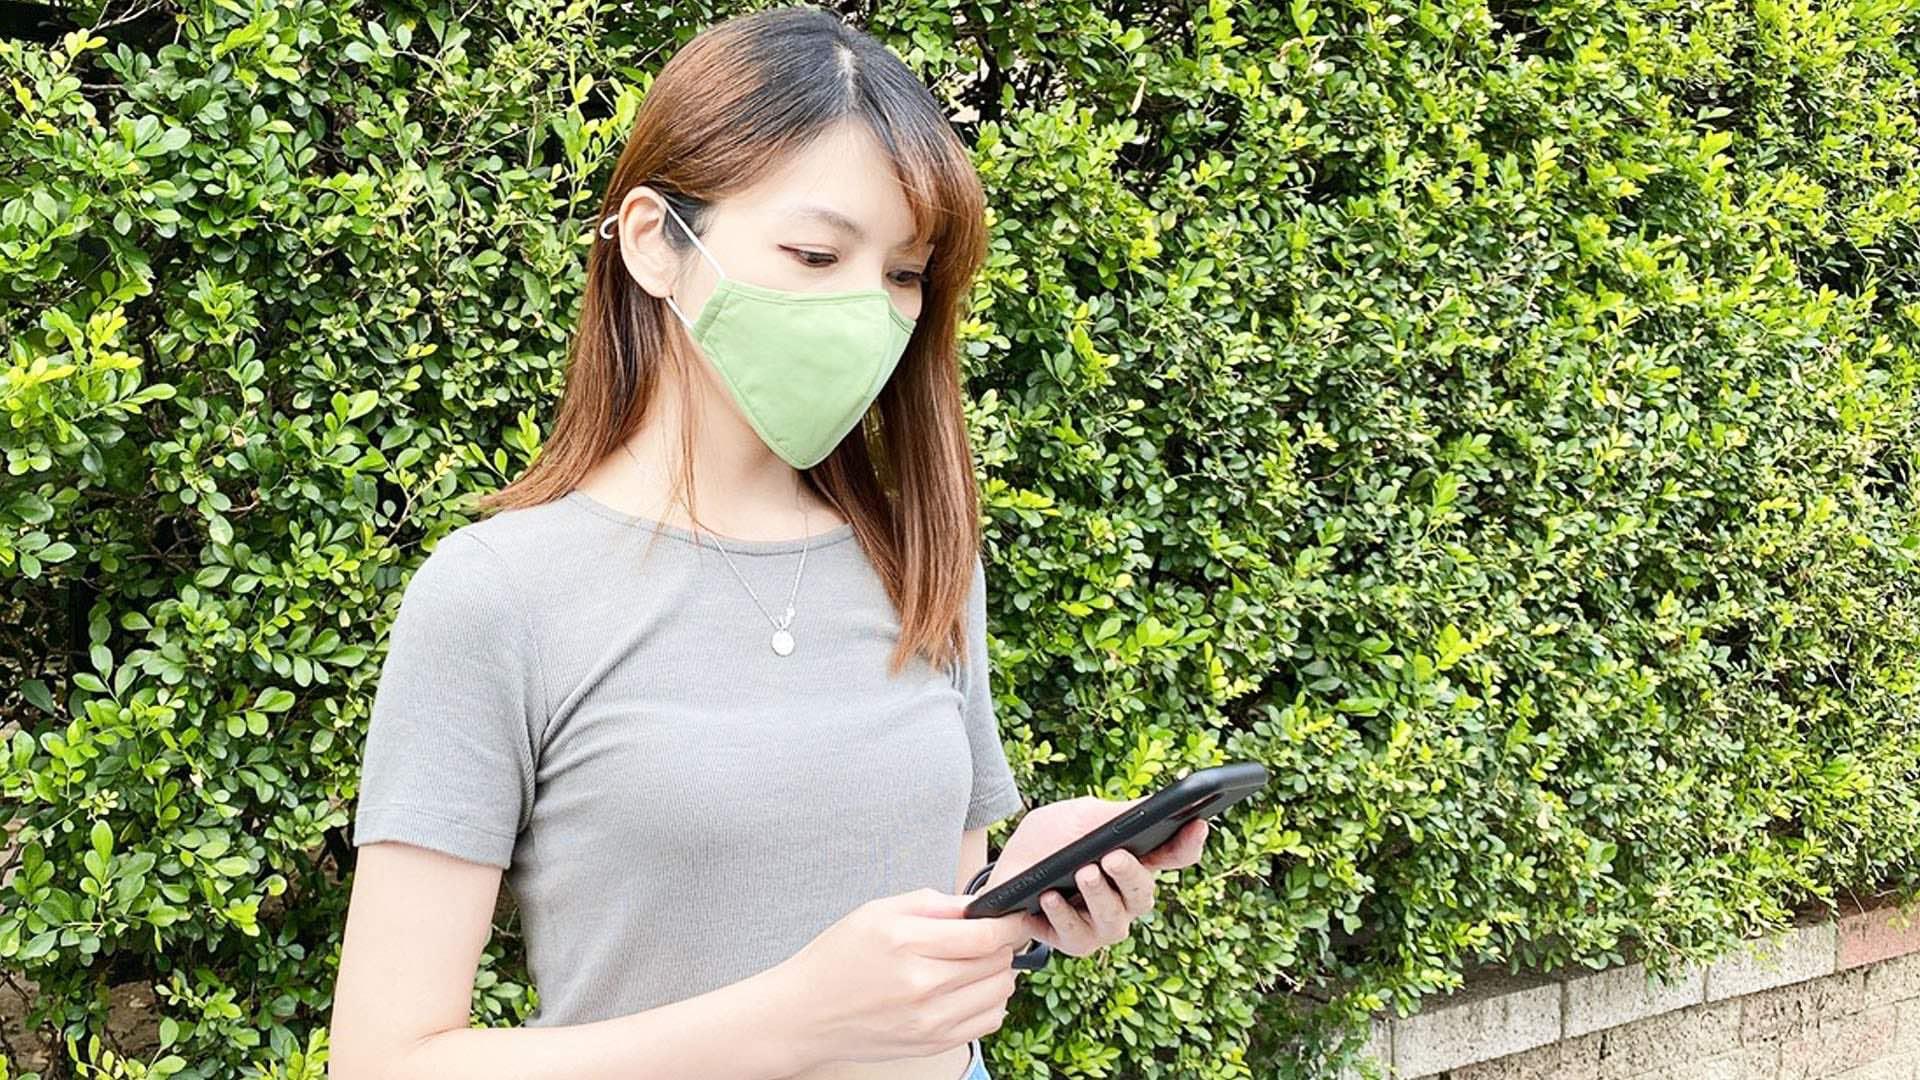 KSAMASK reusable UVC mask kills 99.9% of viruses